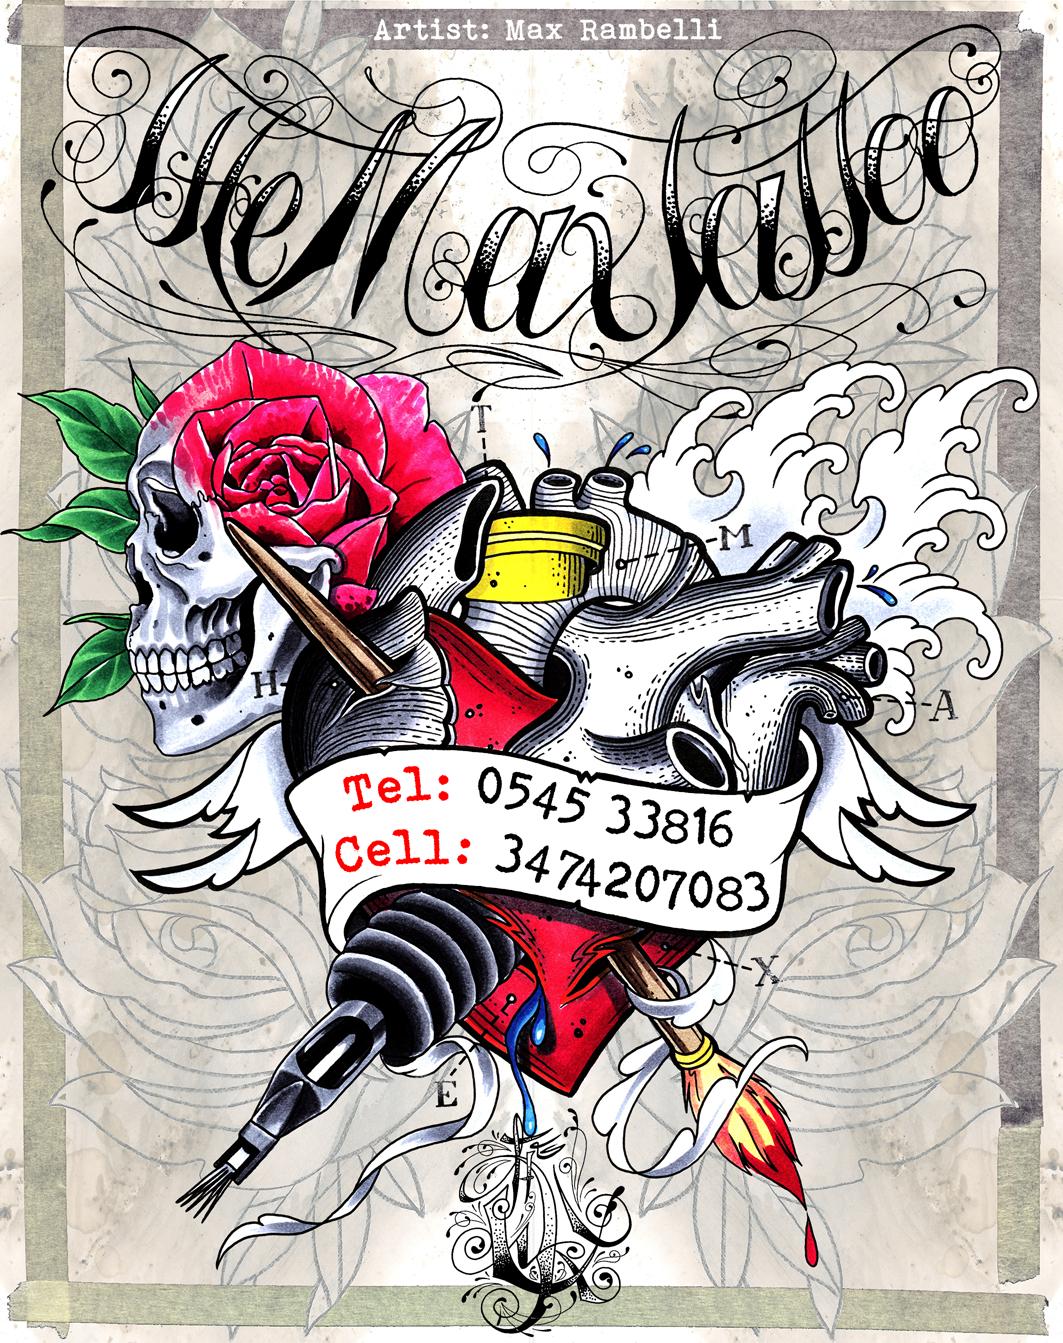 Favorito DOWNLOAD | The Max Tattoo | Tattoo studio a Lugo (RA) CU22